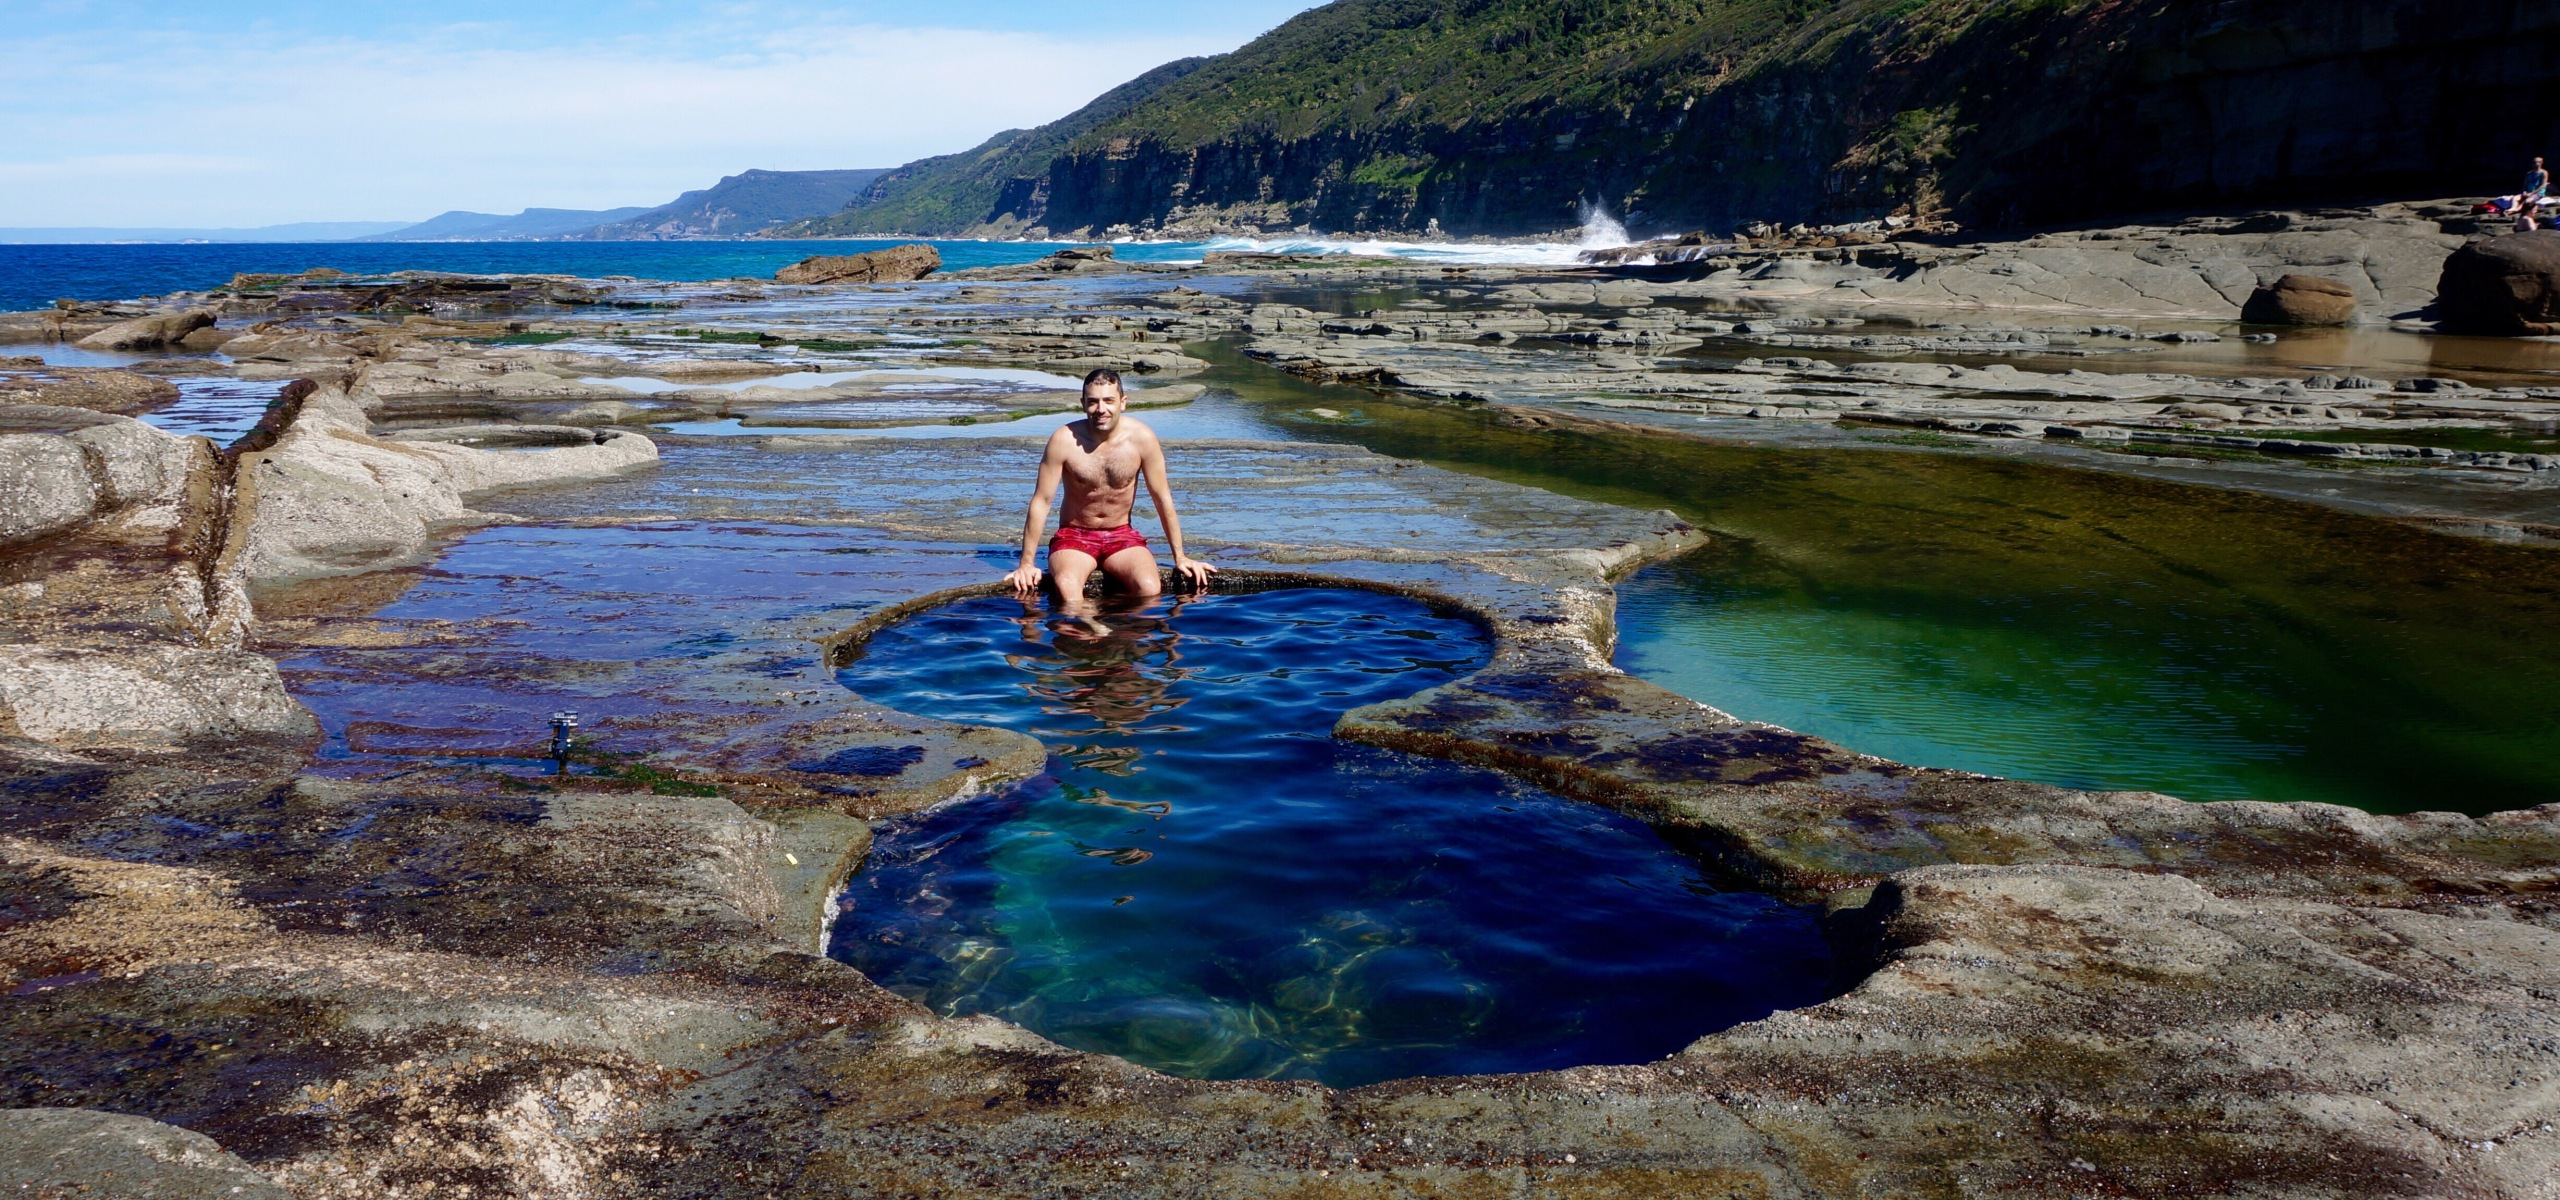 sydney royal national park history list - photo#21